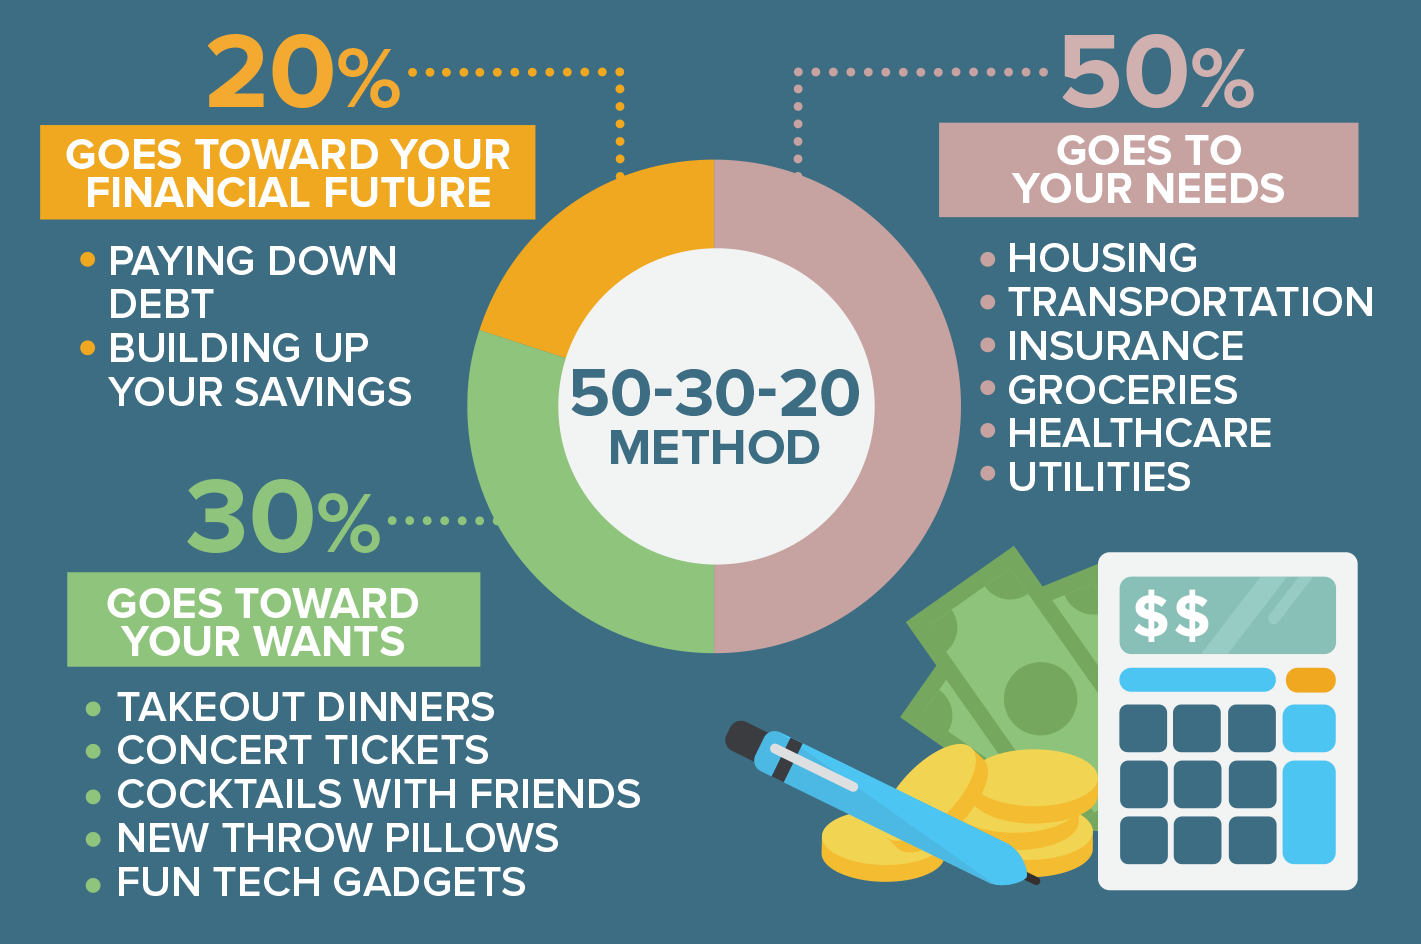 50-30-20 Method